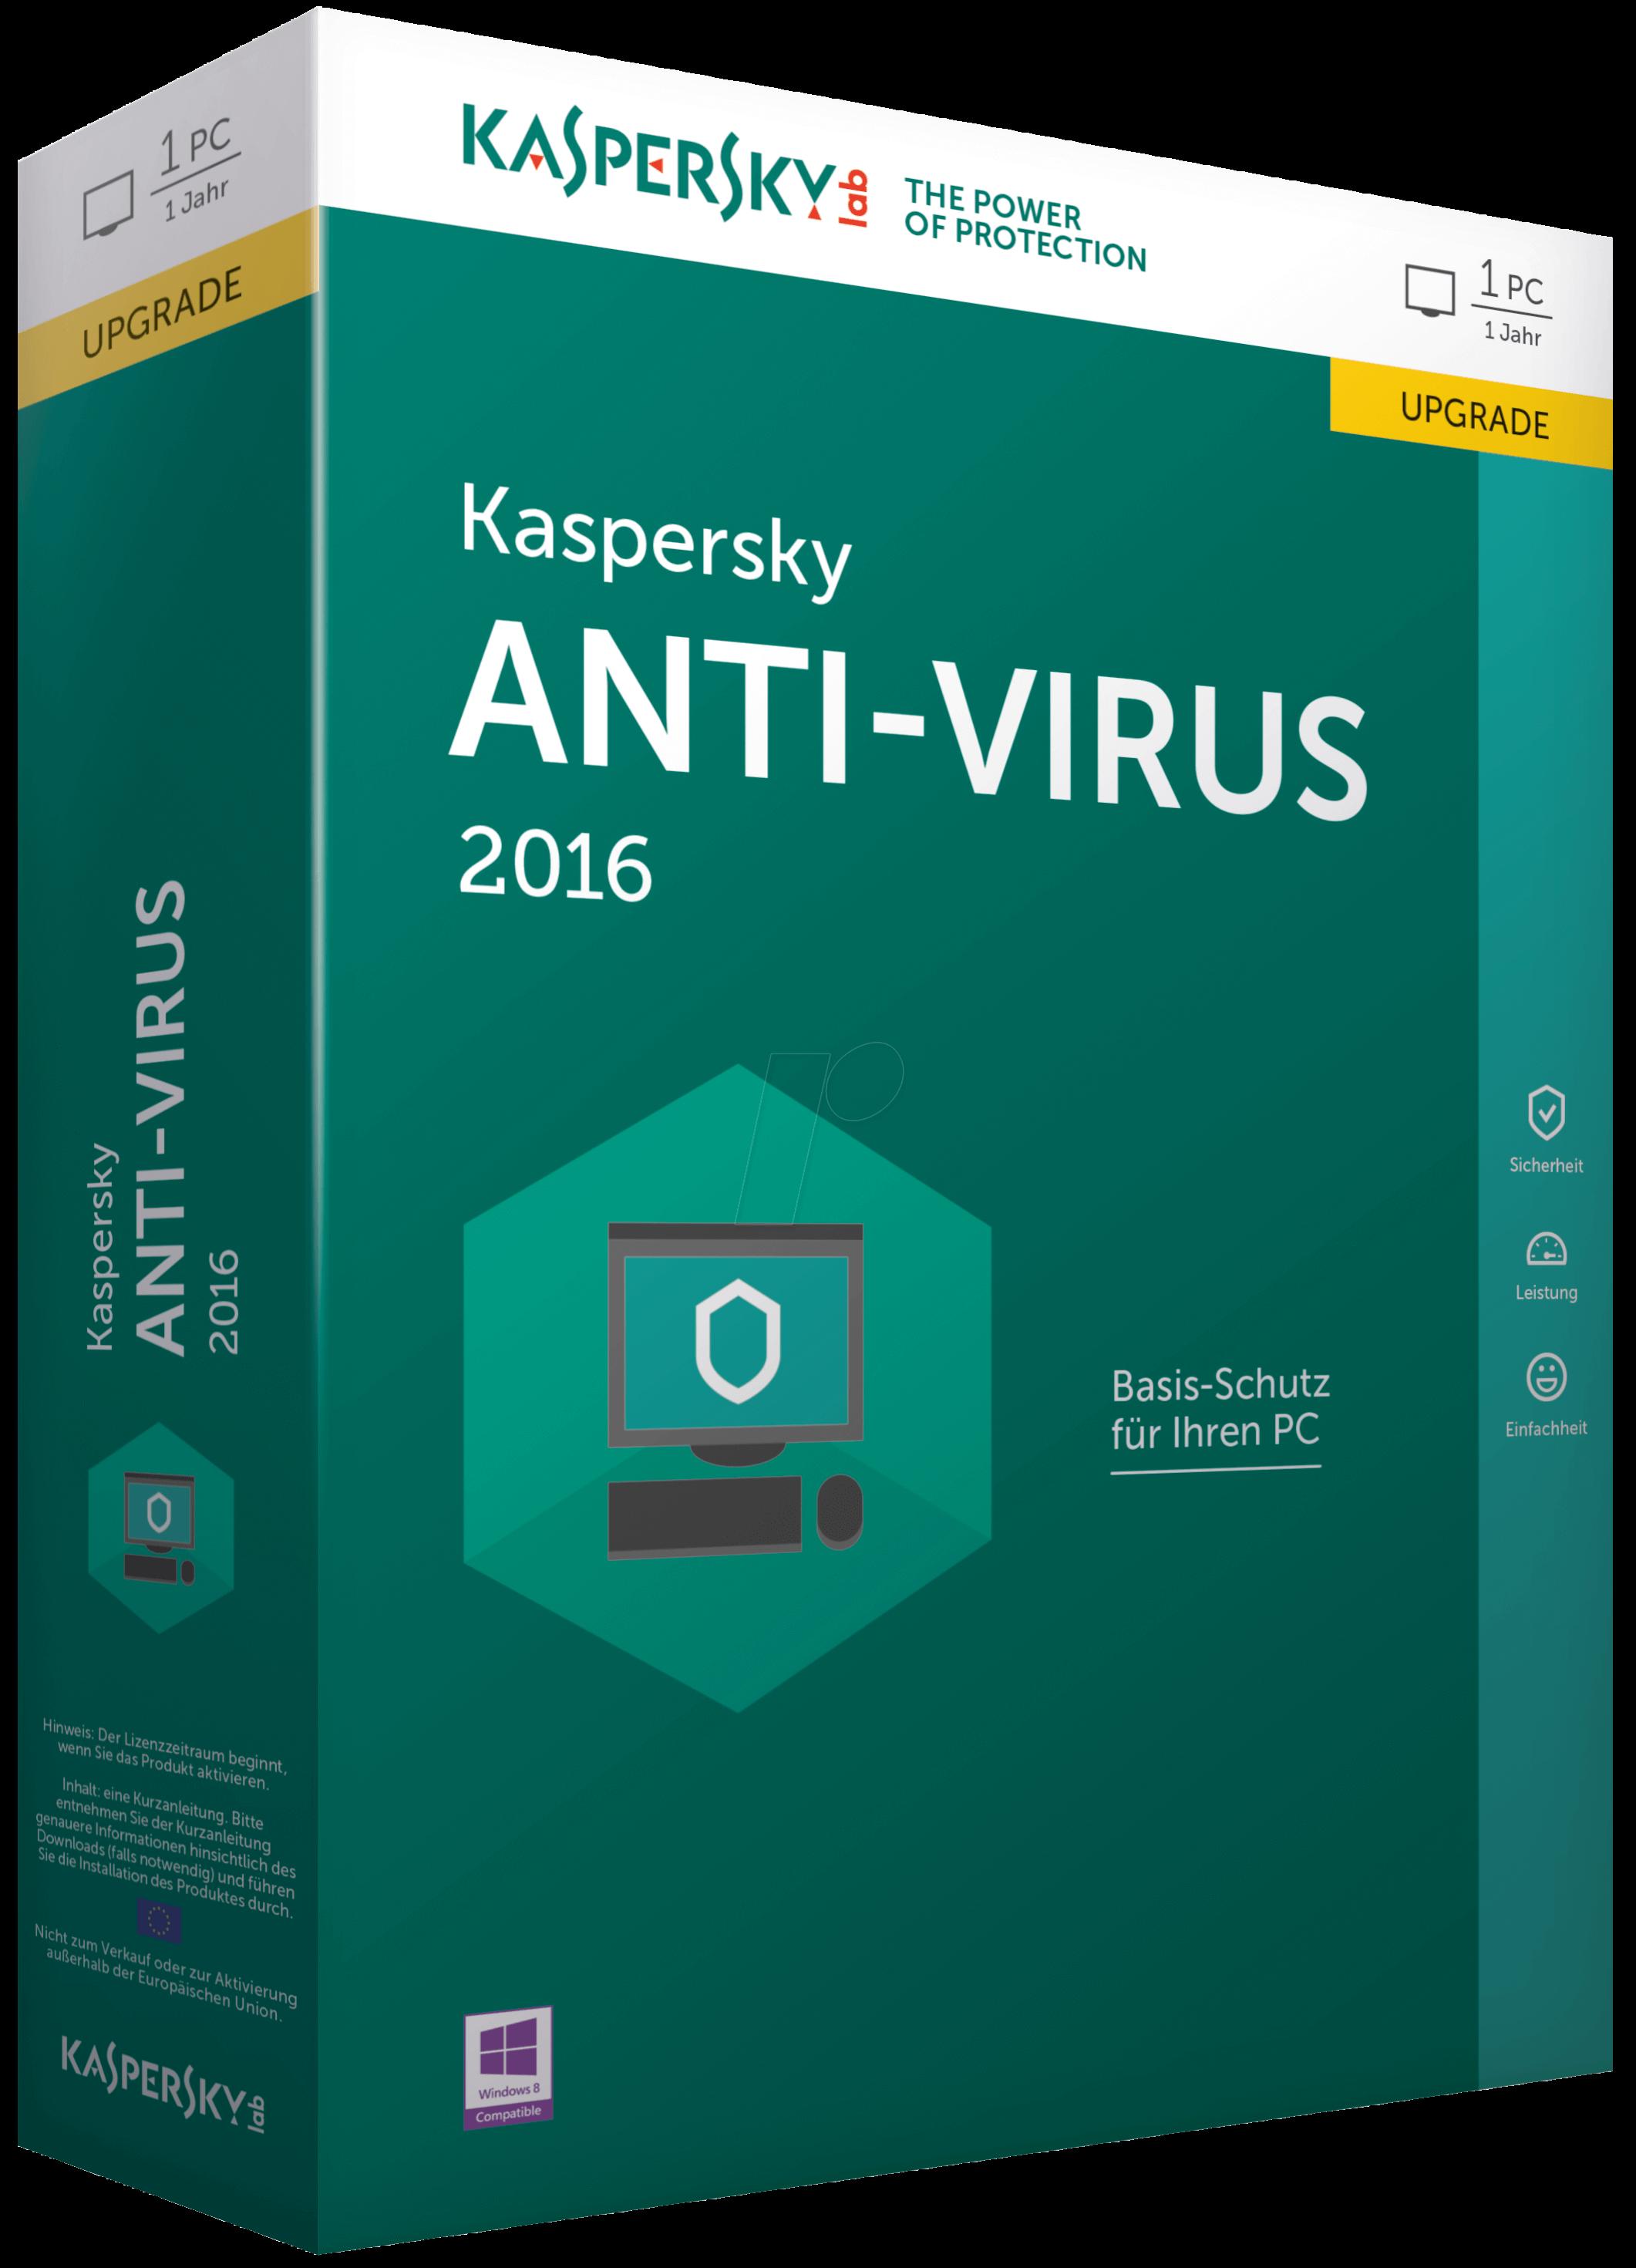 Phần mềm diệt virut ANTI-Virus Kaspersky 1PC/ 1 Năm (KAS )